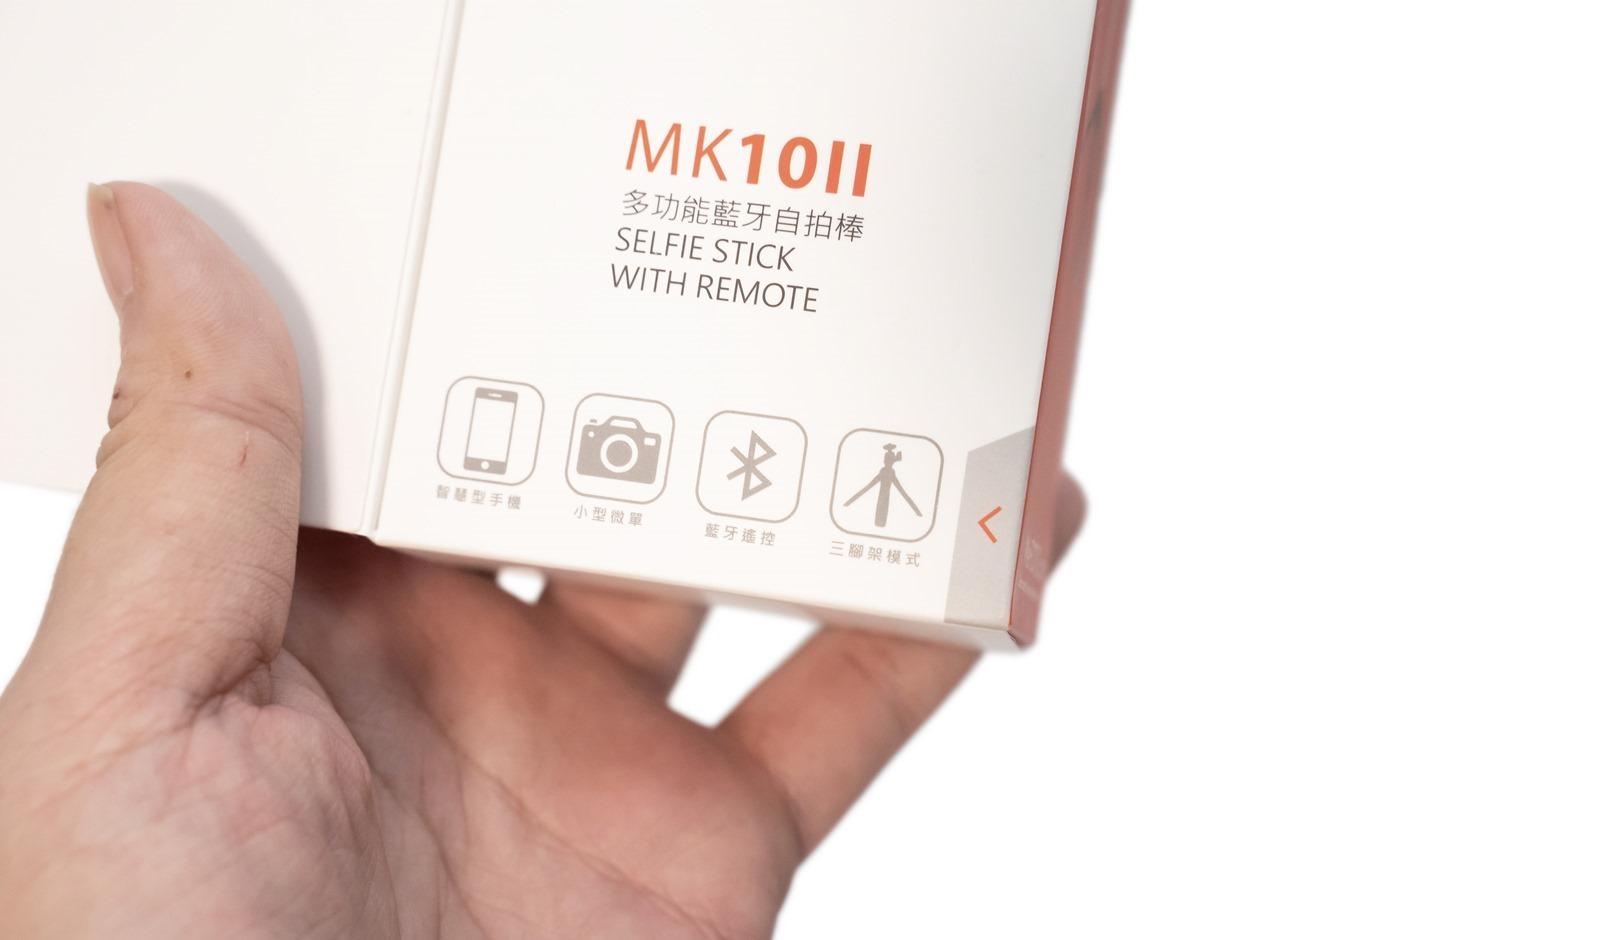 MeFOTO 美孚 MK10II 藍牙自拍迷你腳架開箱分享 + 一代 MK10 & 小米支架自拍棒對比 @3C 達人廖阿輝